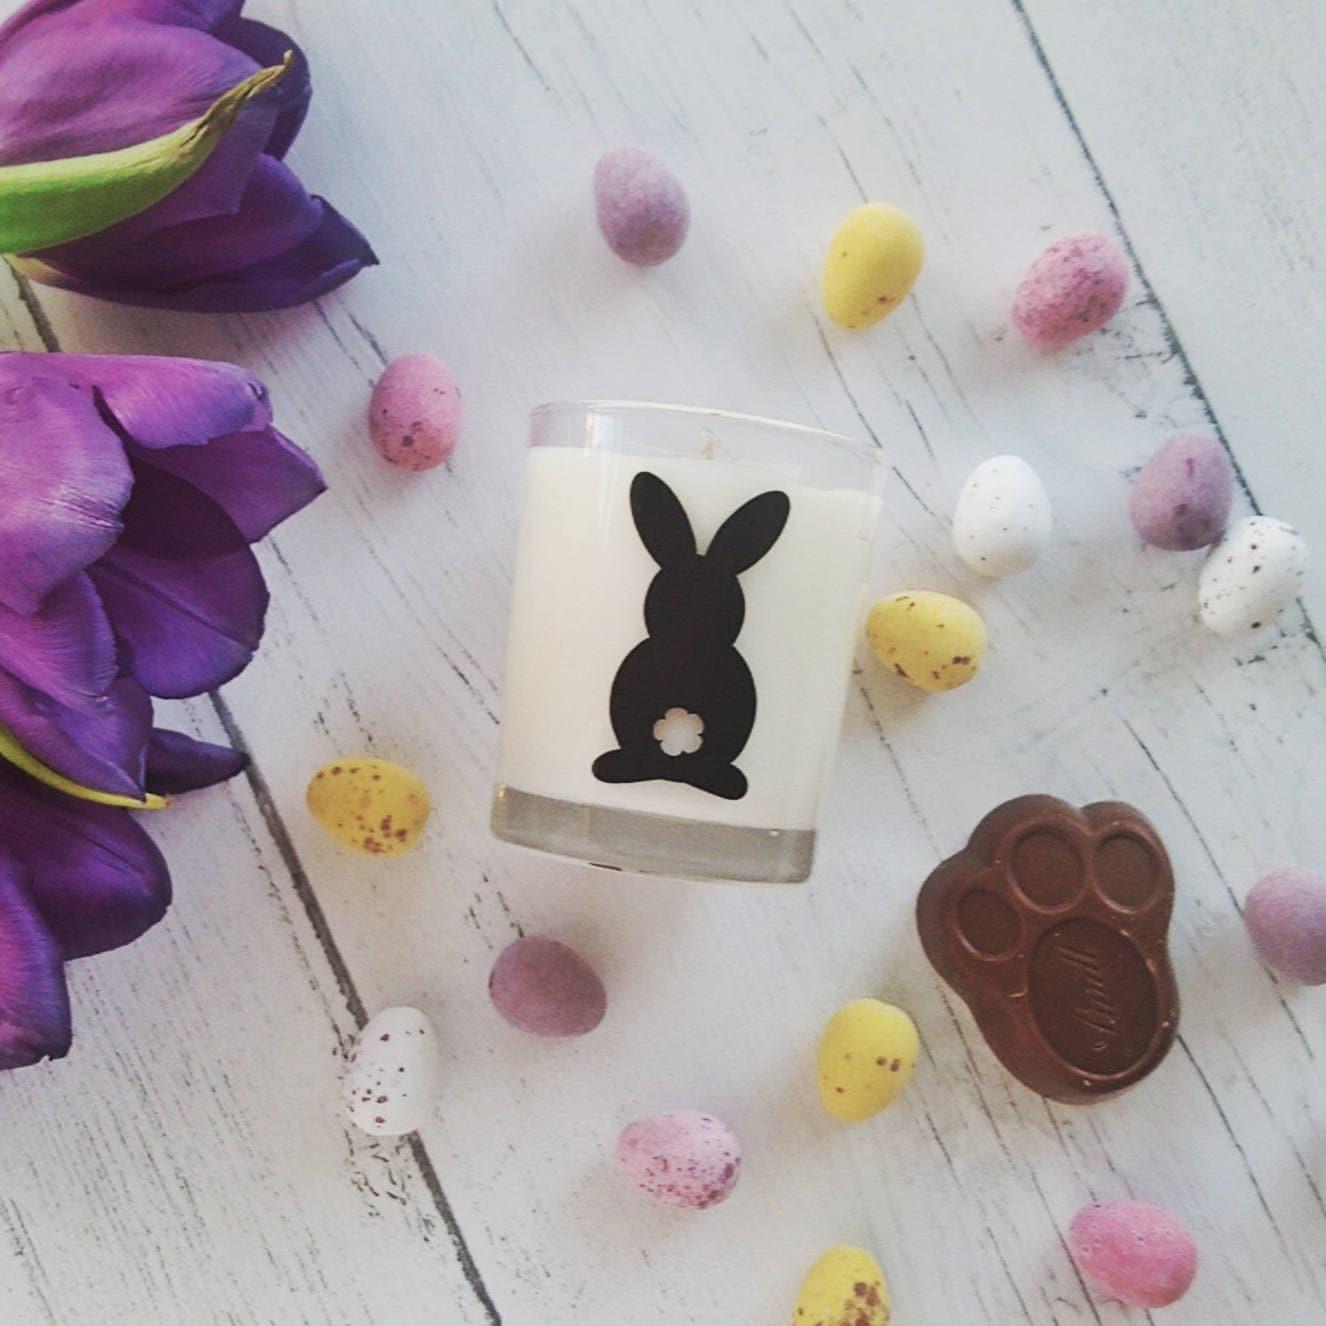 Bunny Decor Rabbit Decor Easter Decorations Easter Decor Easter Gift Easter Candles Easter Candle Holder Easter Chocolate